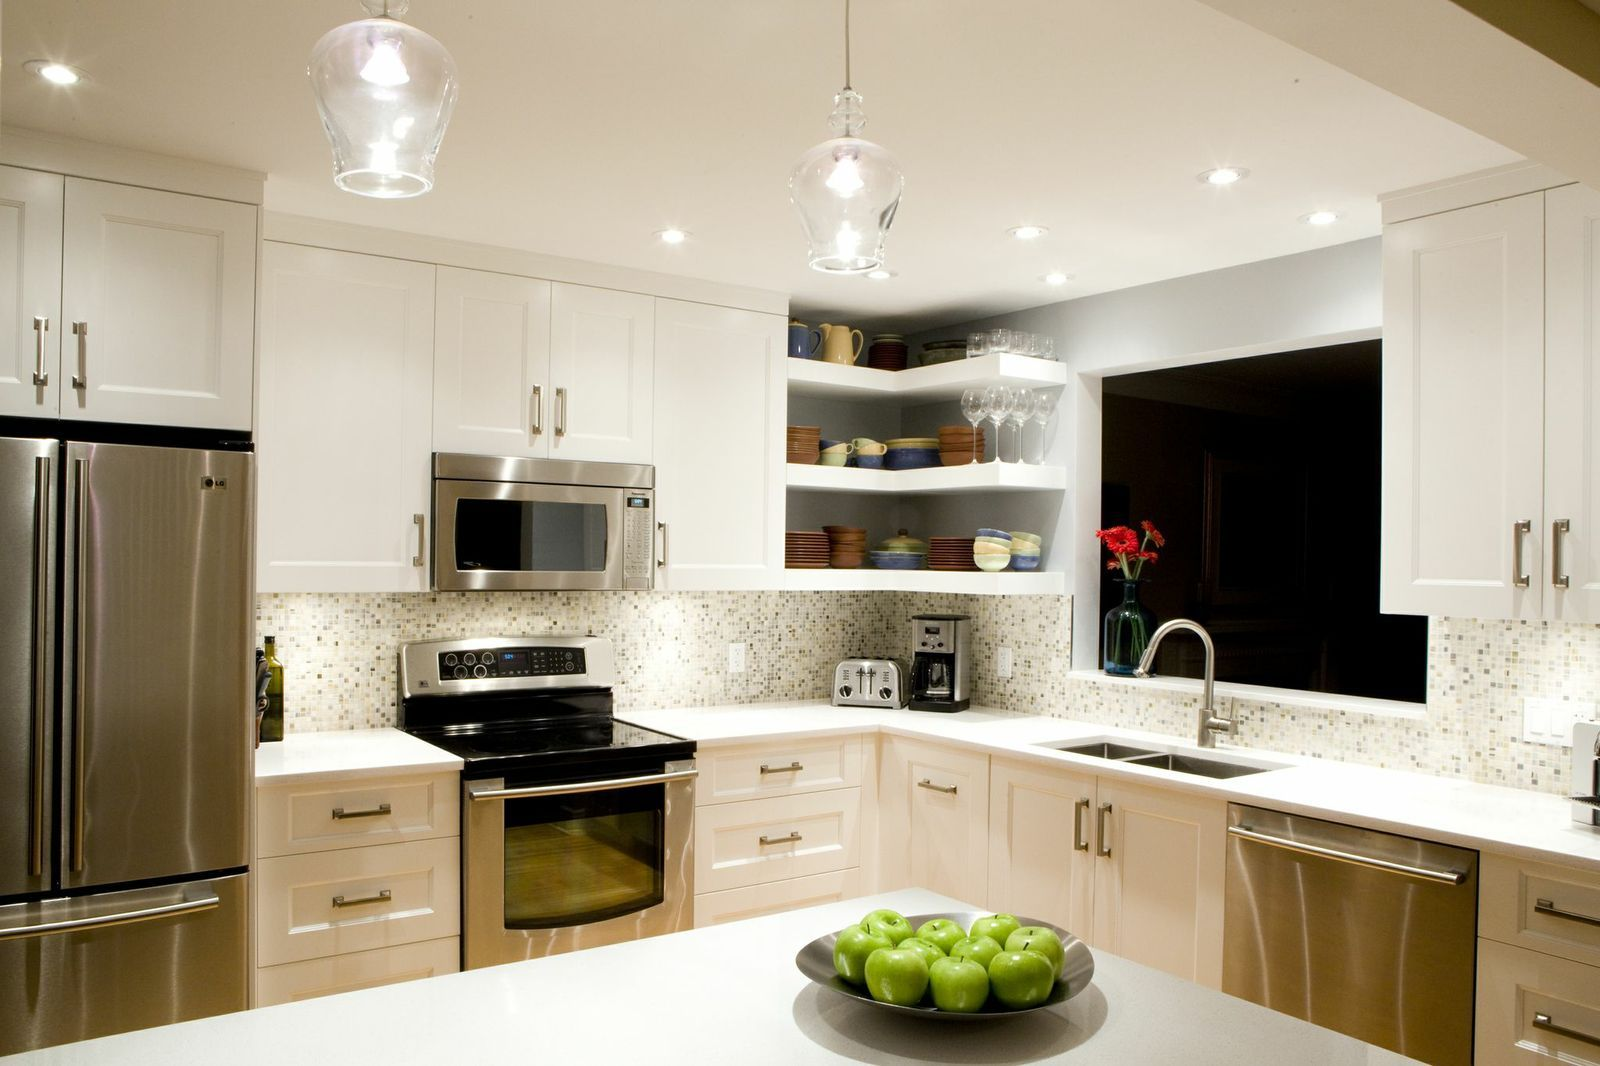 astro design's contemporary kitchen design - #ottawa   kitchens